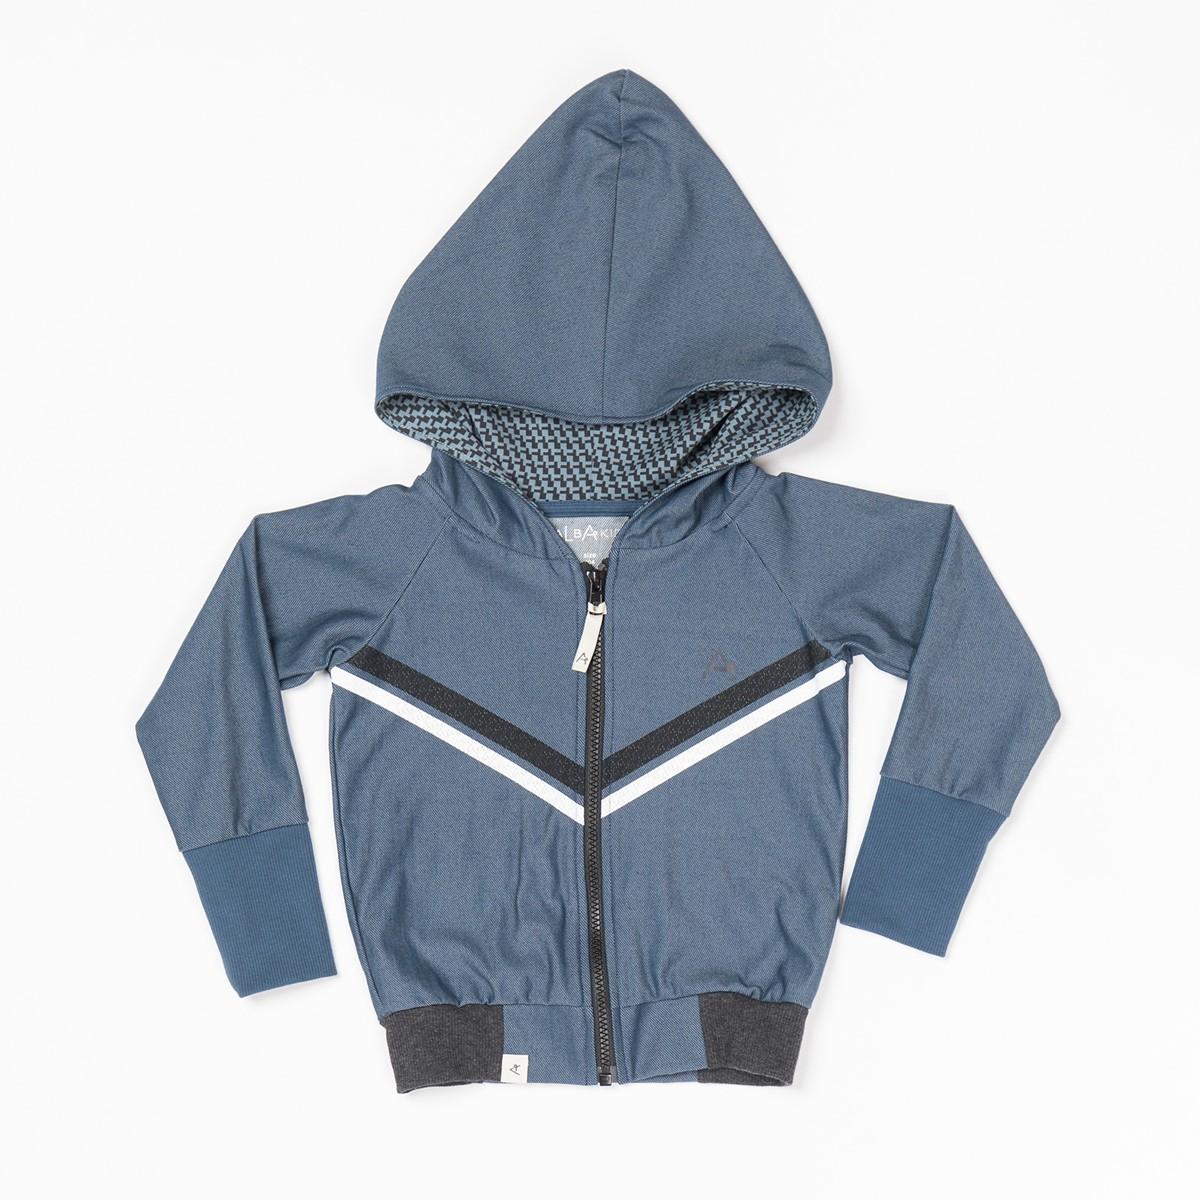 Adam zipper hoodie